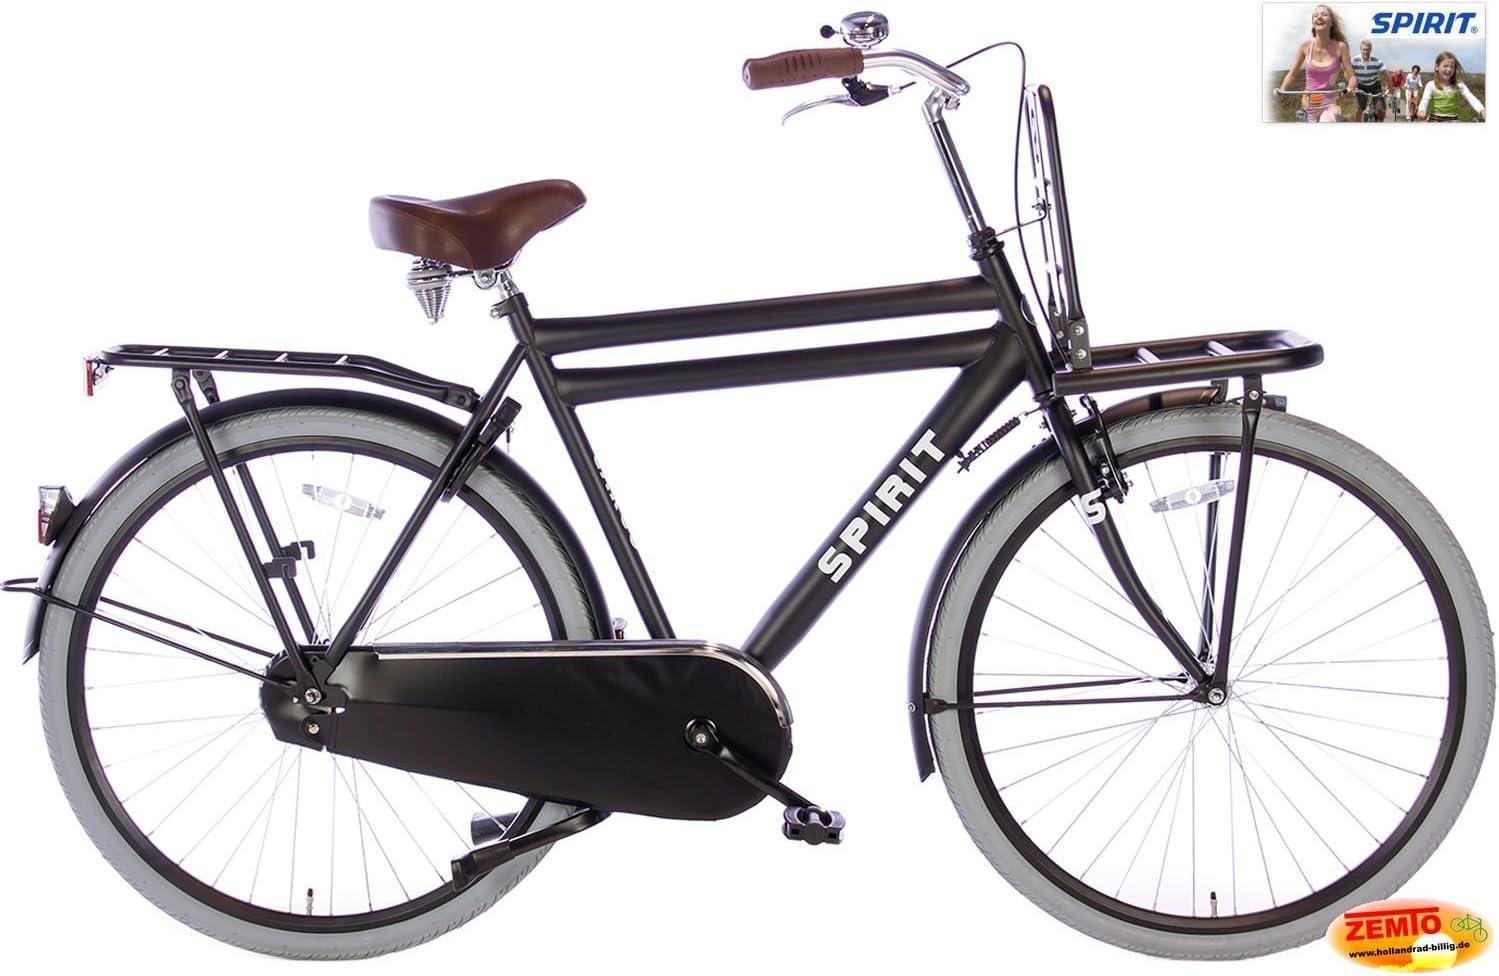 Spirit Bicicleta Holandesa para Hombre Cargo 28 Pulgadas Negro ...